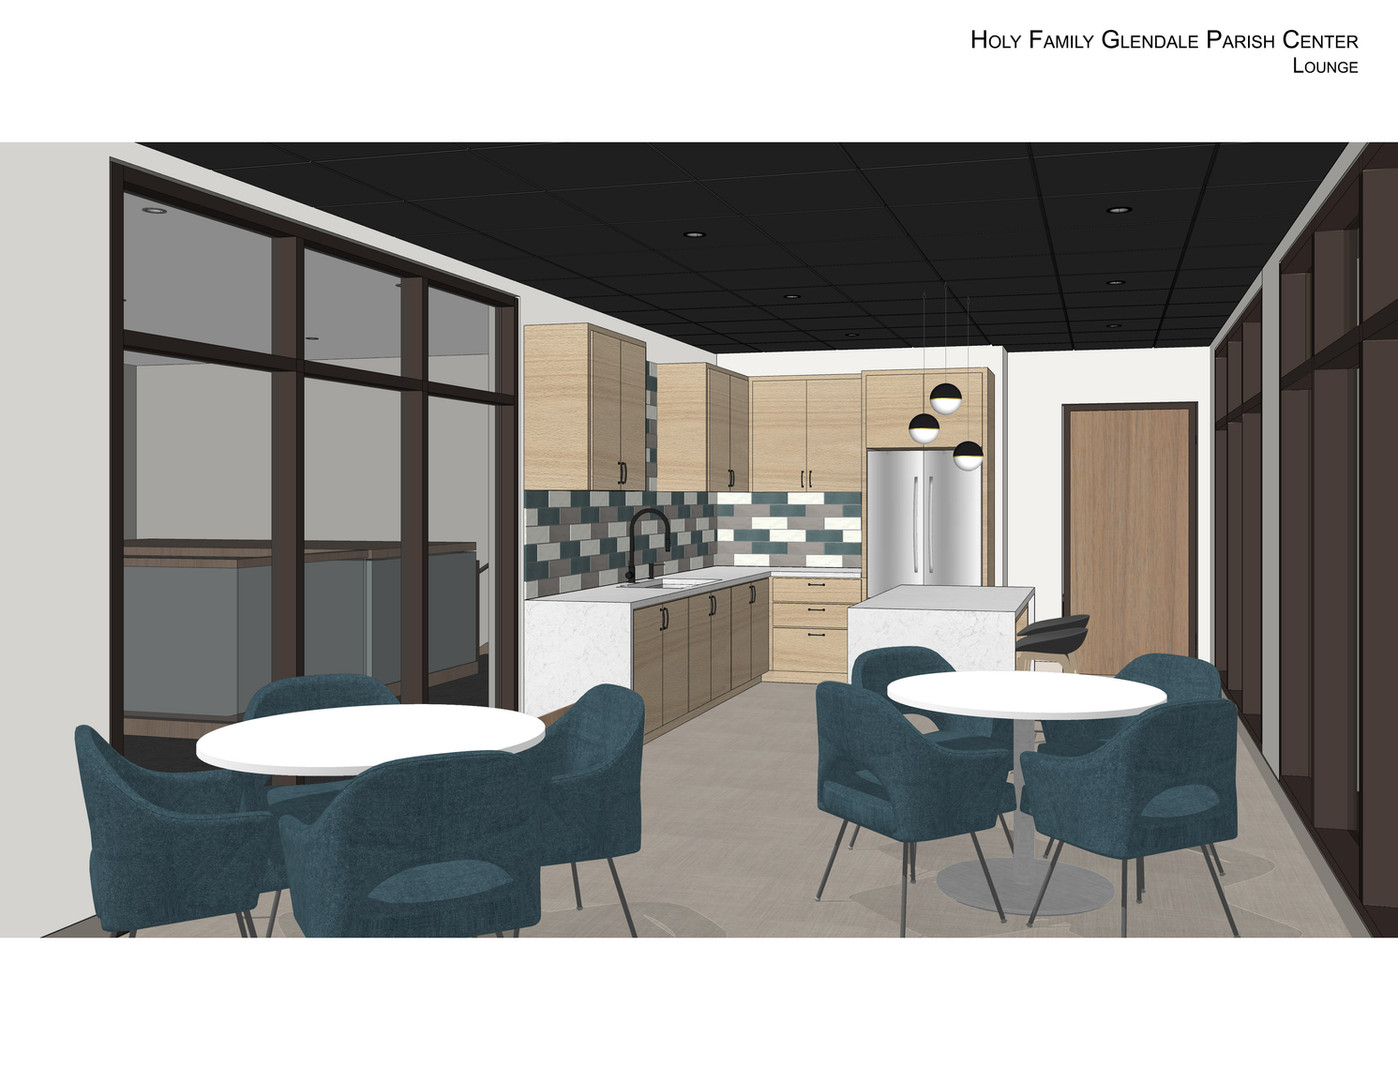 06_Lounge 01.jpg